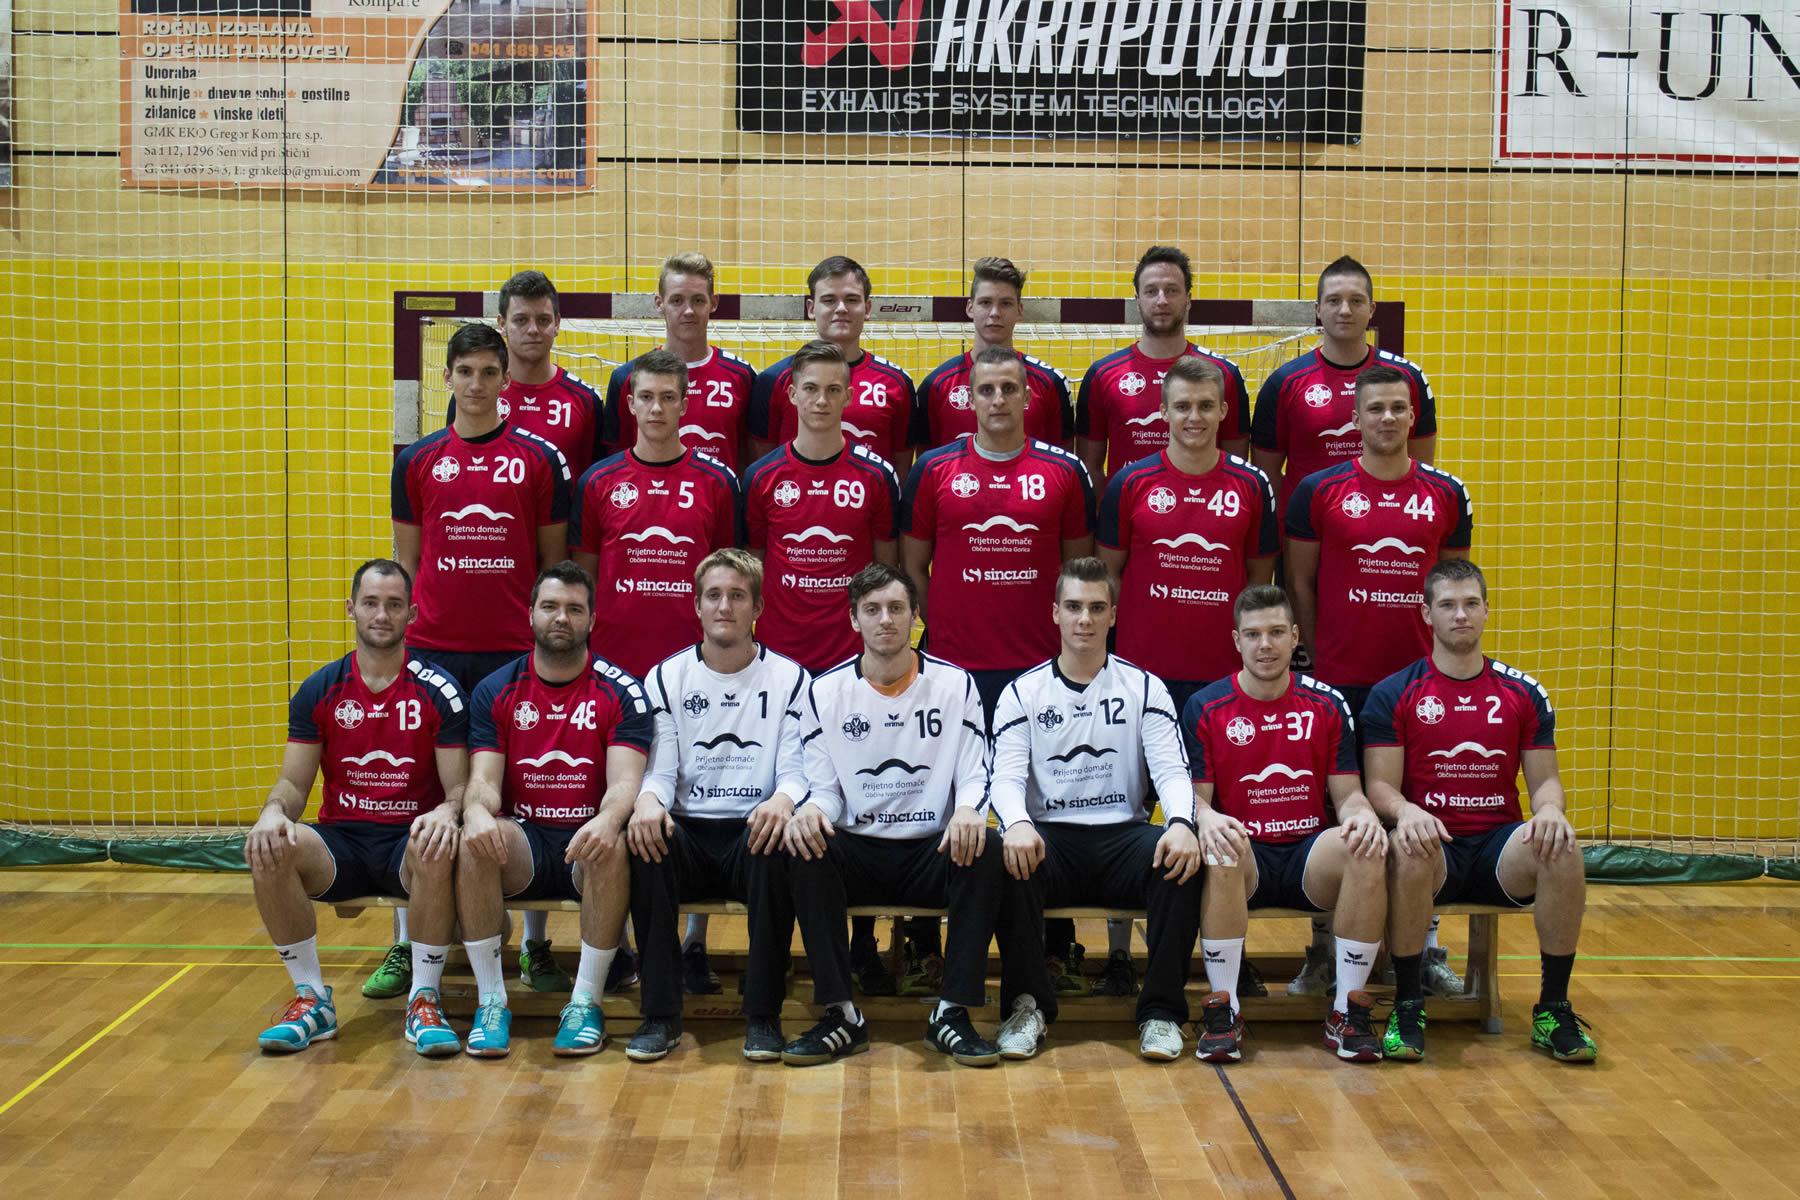 Članska ekipa v rdečih dresih